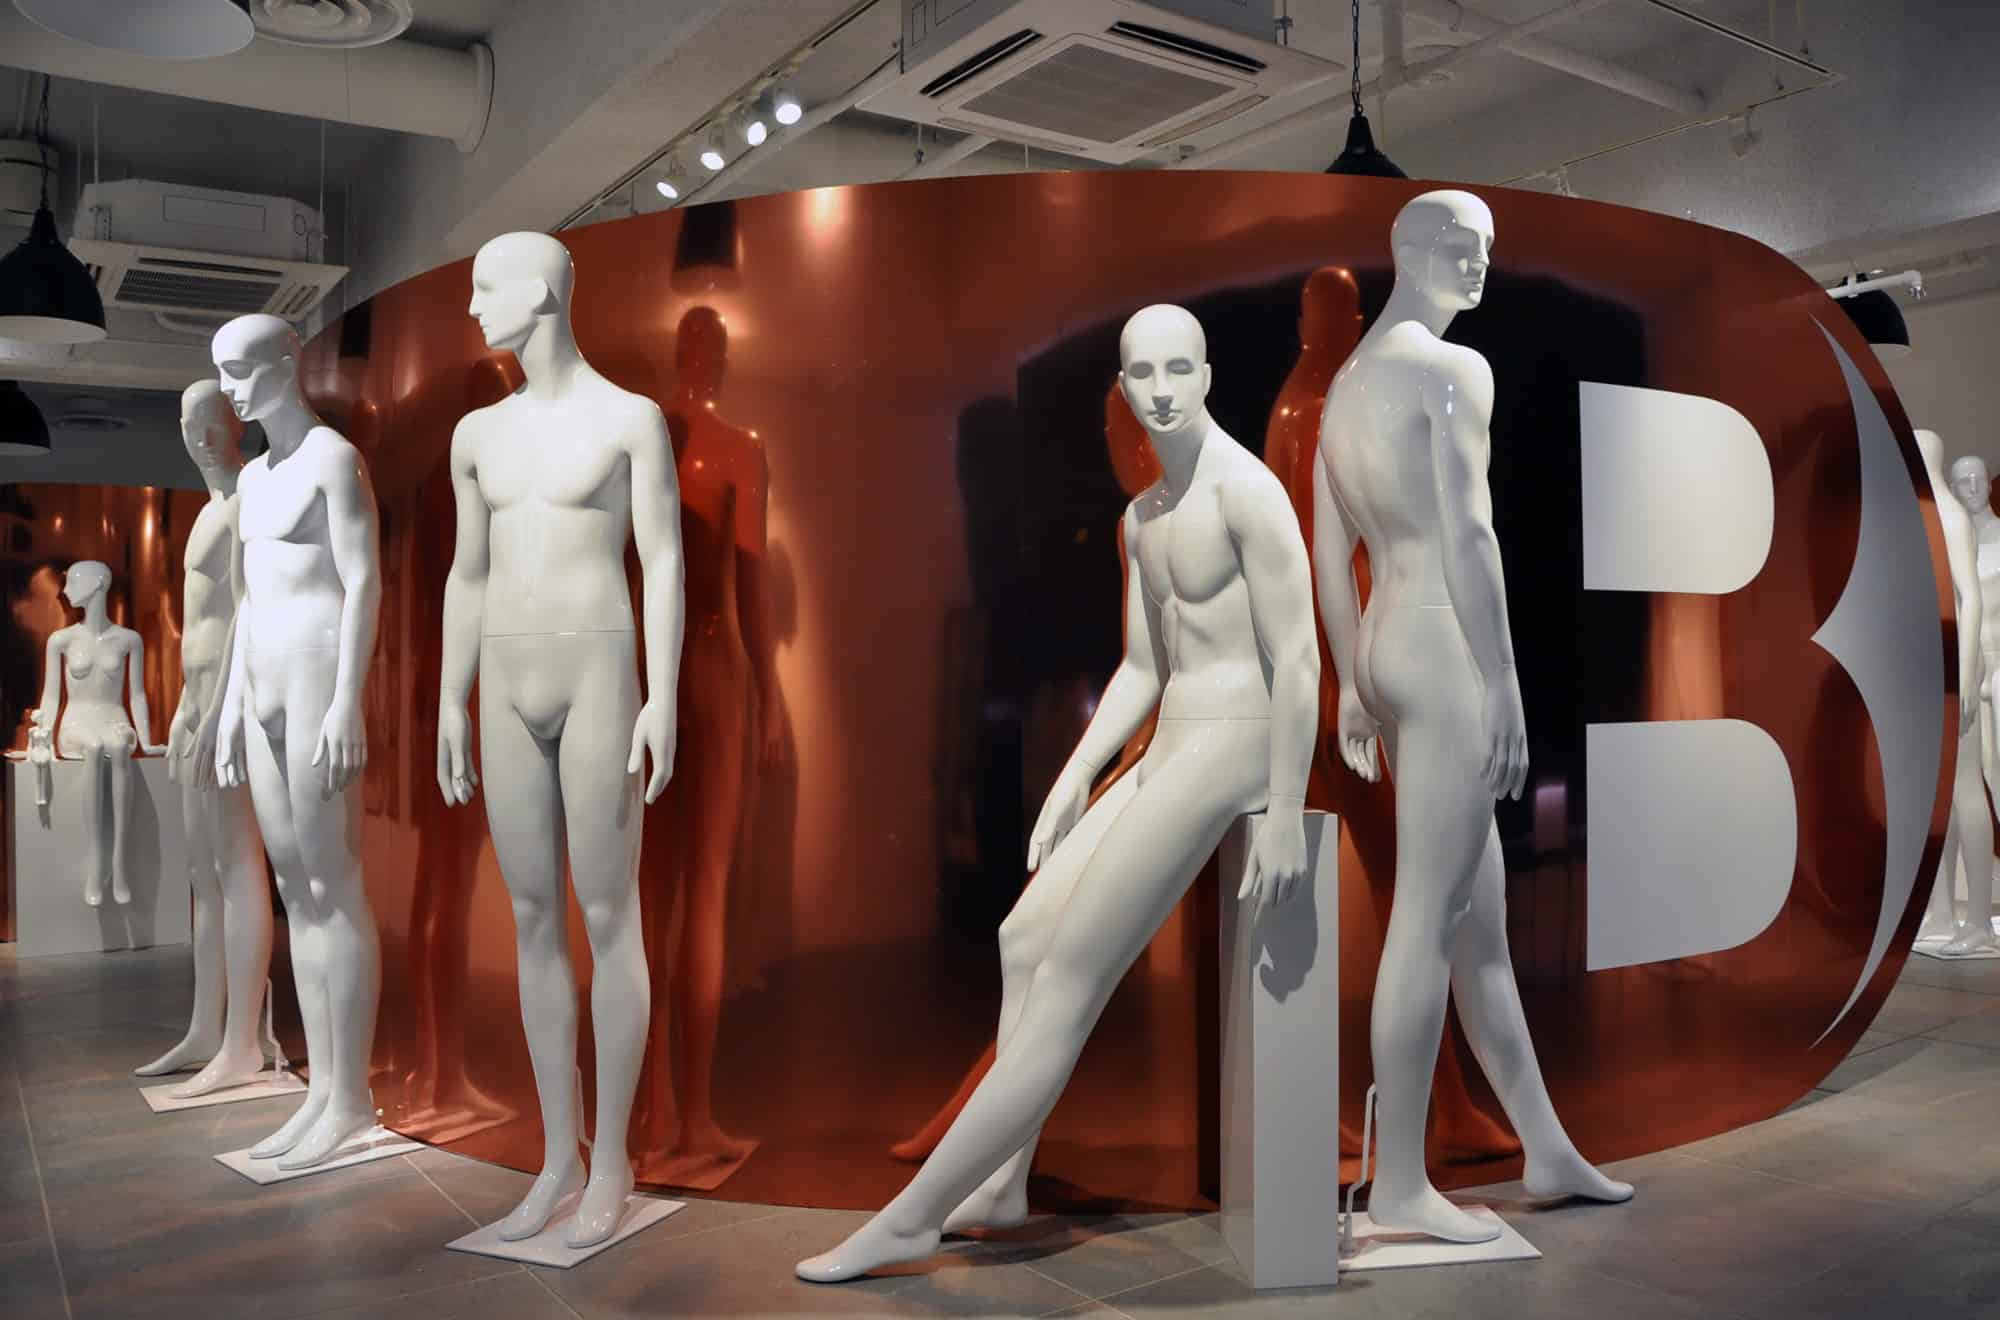 bonaveri mannequin exhibition tokyo japan 07